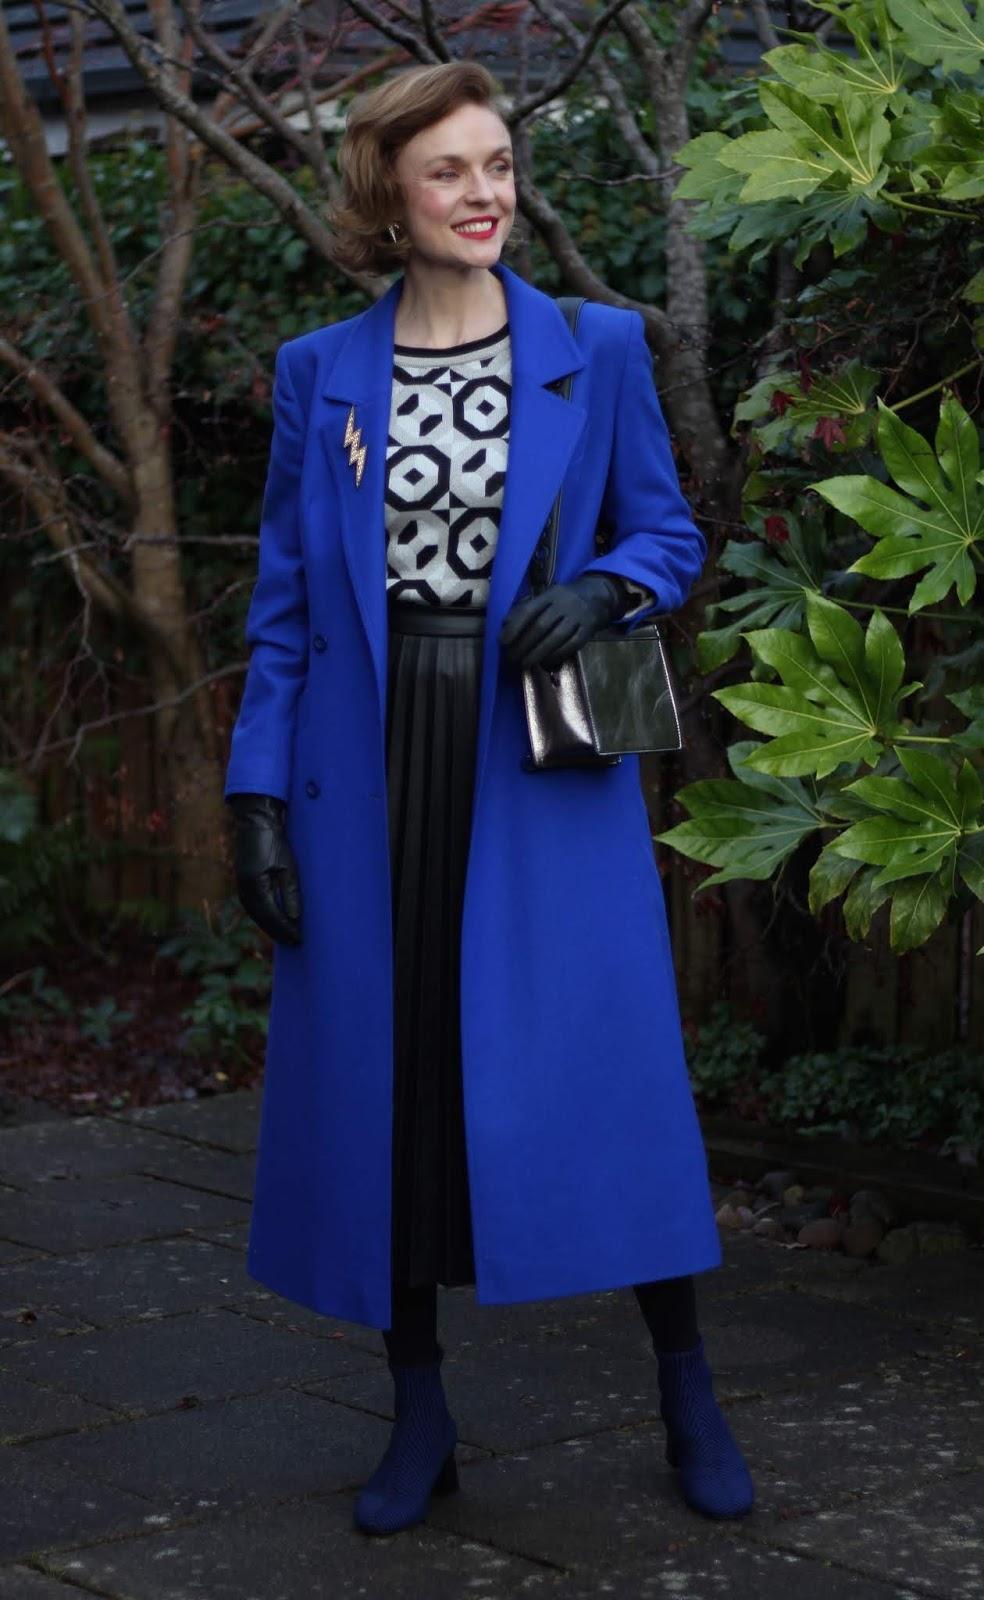 Cobalt Blue Coat, Black Leather Pleated Skirt | Fake Fabulous